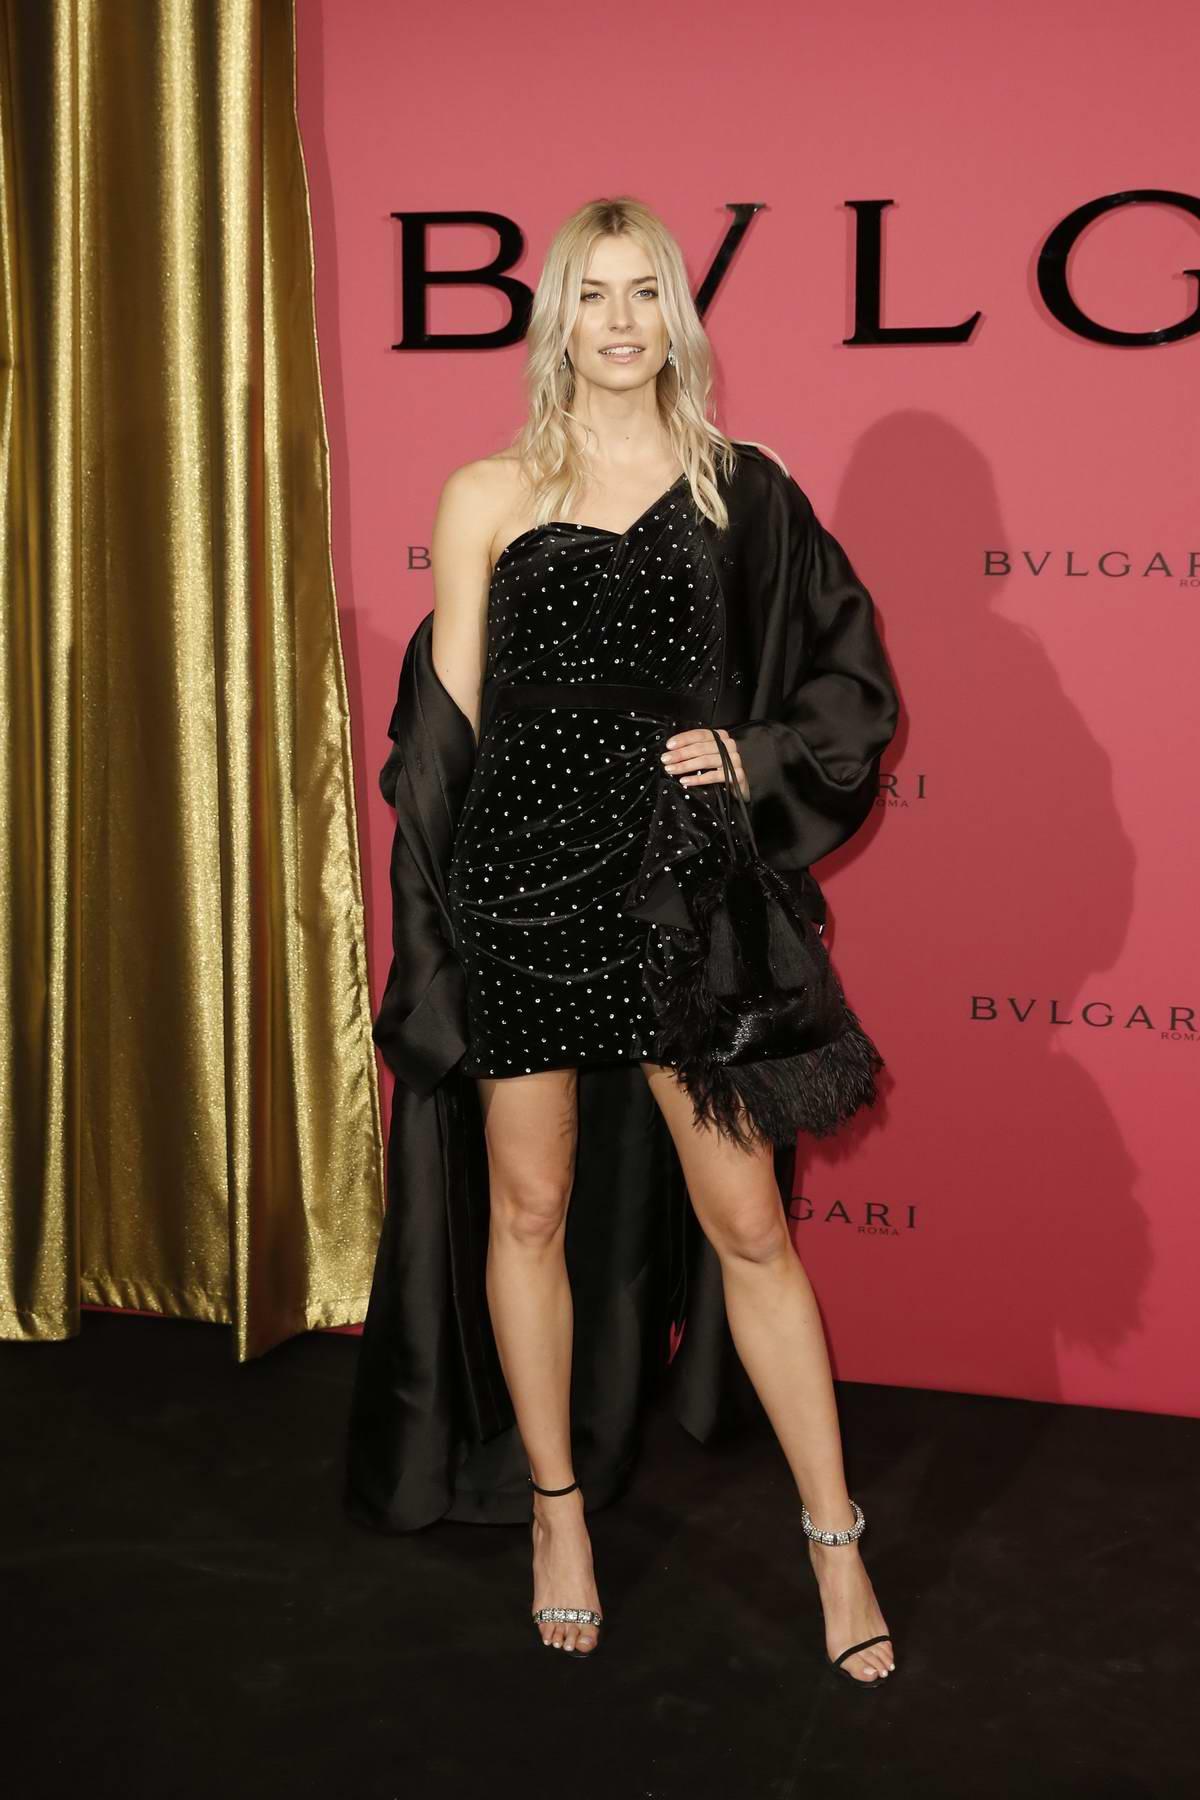 Lena Gercke attends the Bulgari Party during 69th Berlinale International Film Festival in Berlin, Germany